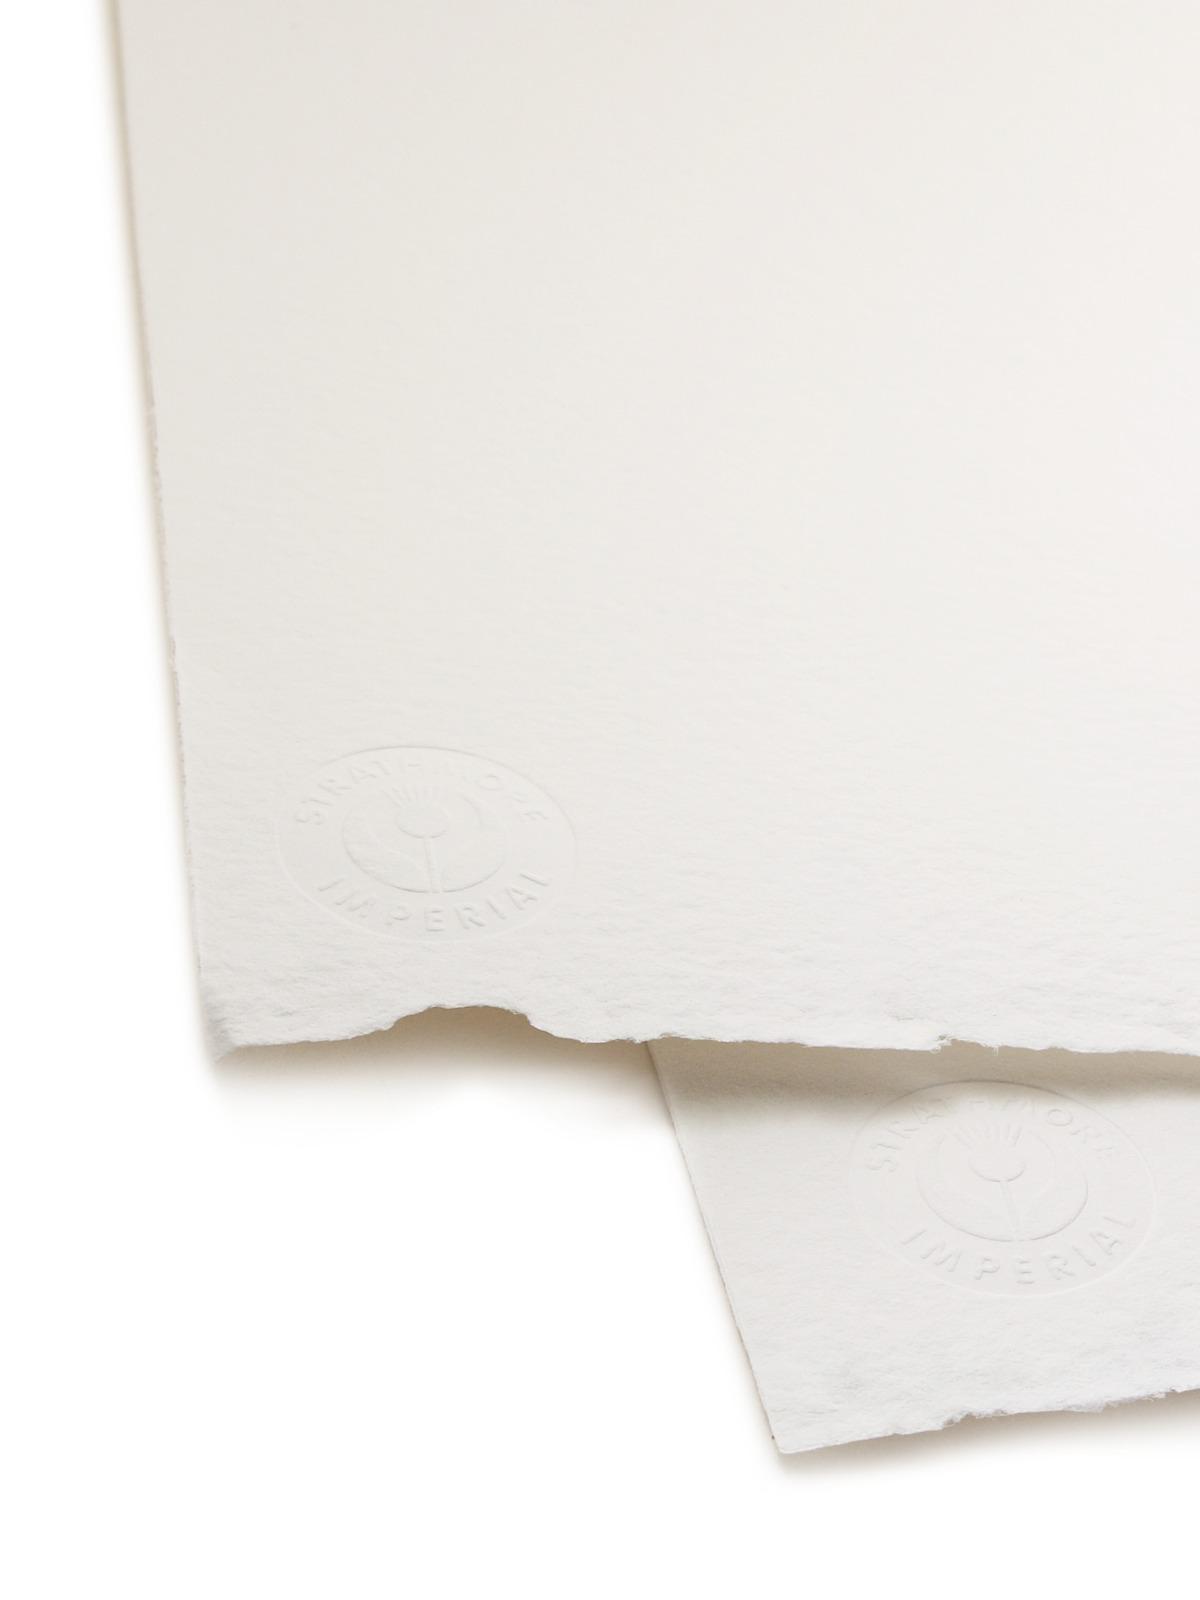 Series 500 Imperial Watercolor Paper